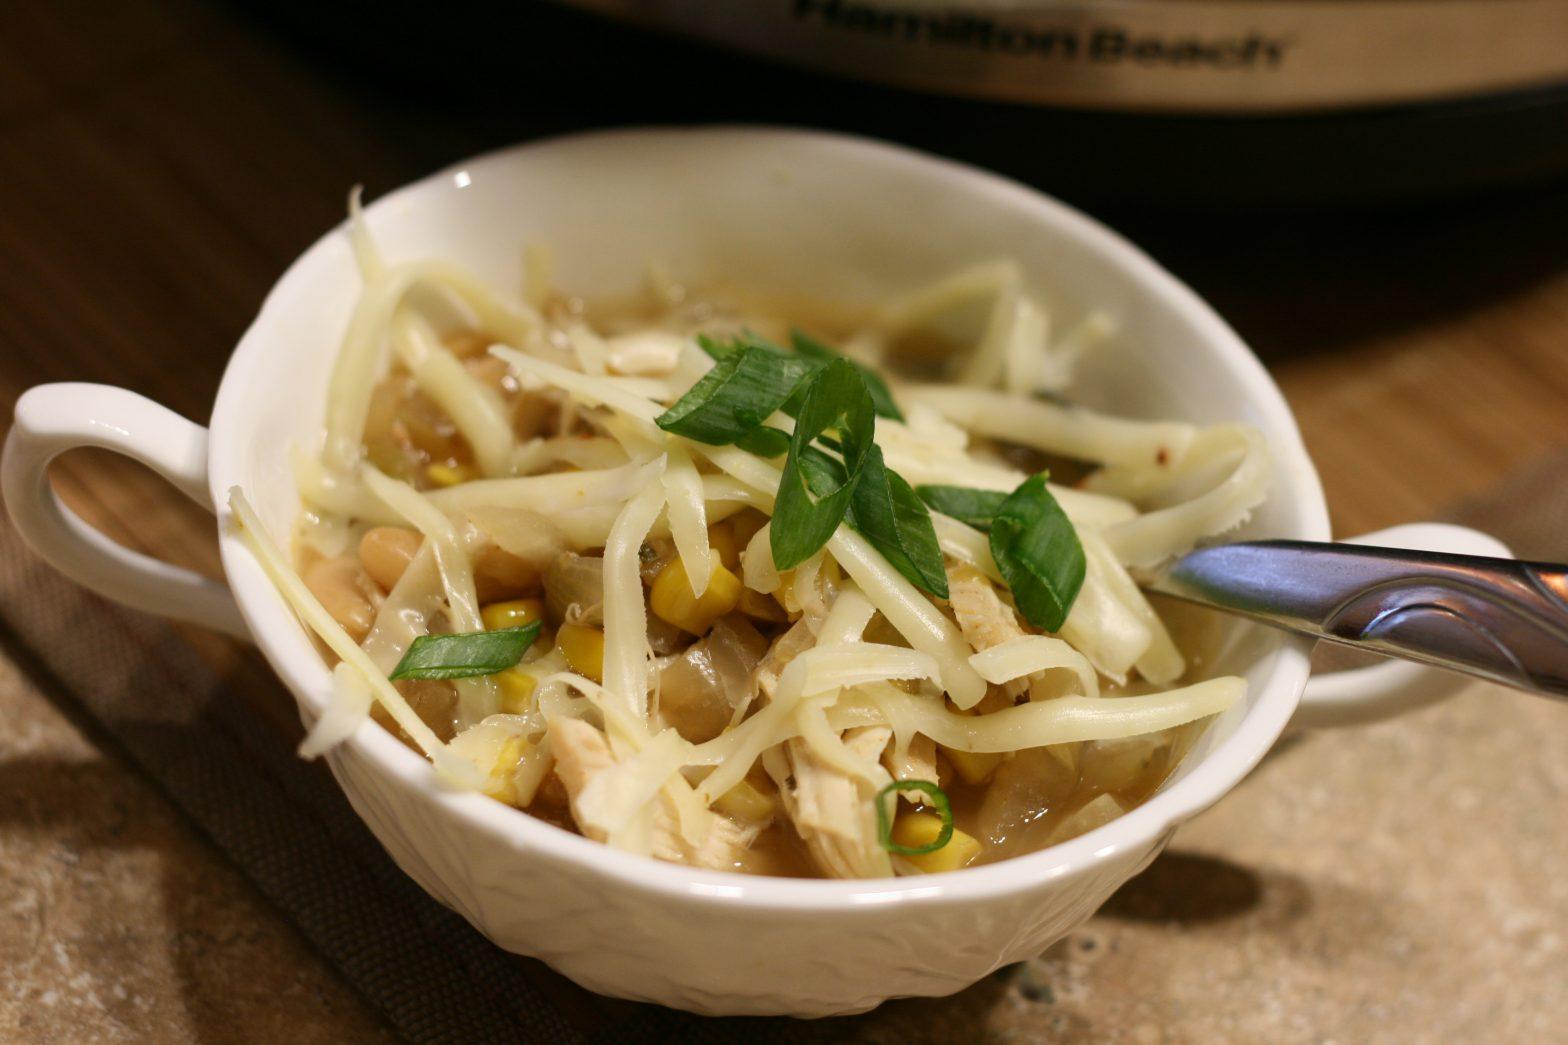 slow cooker white chili